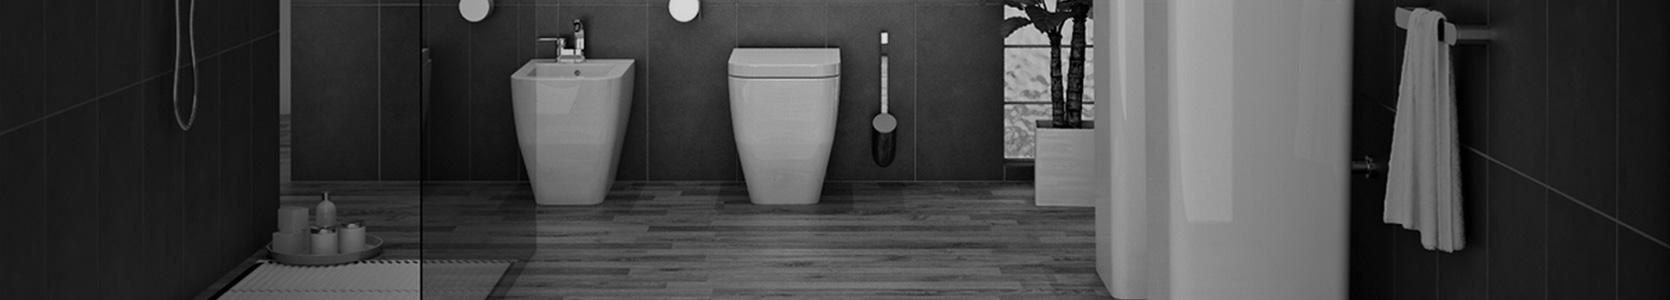 Rešenja za kupatila